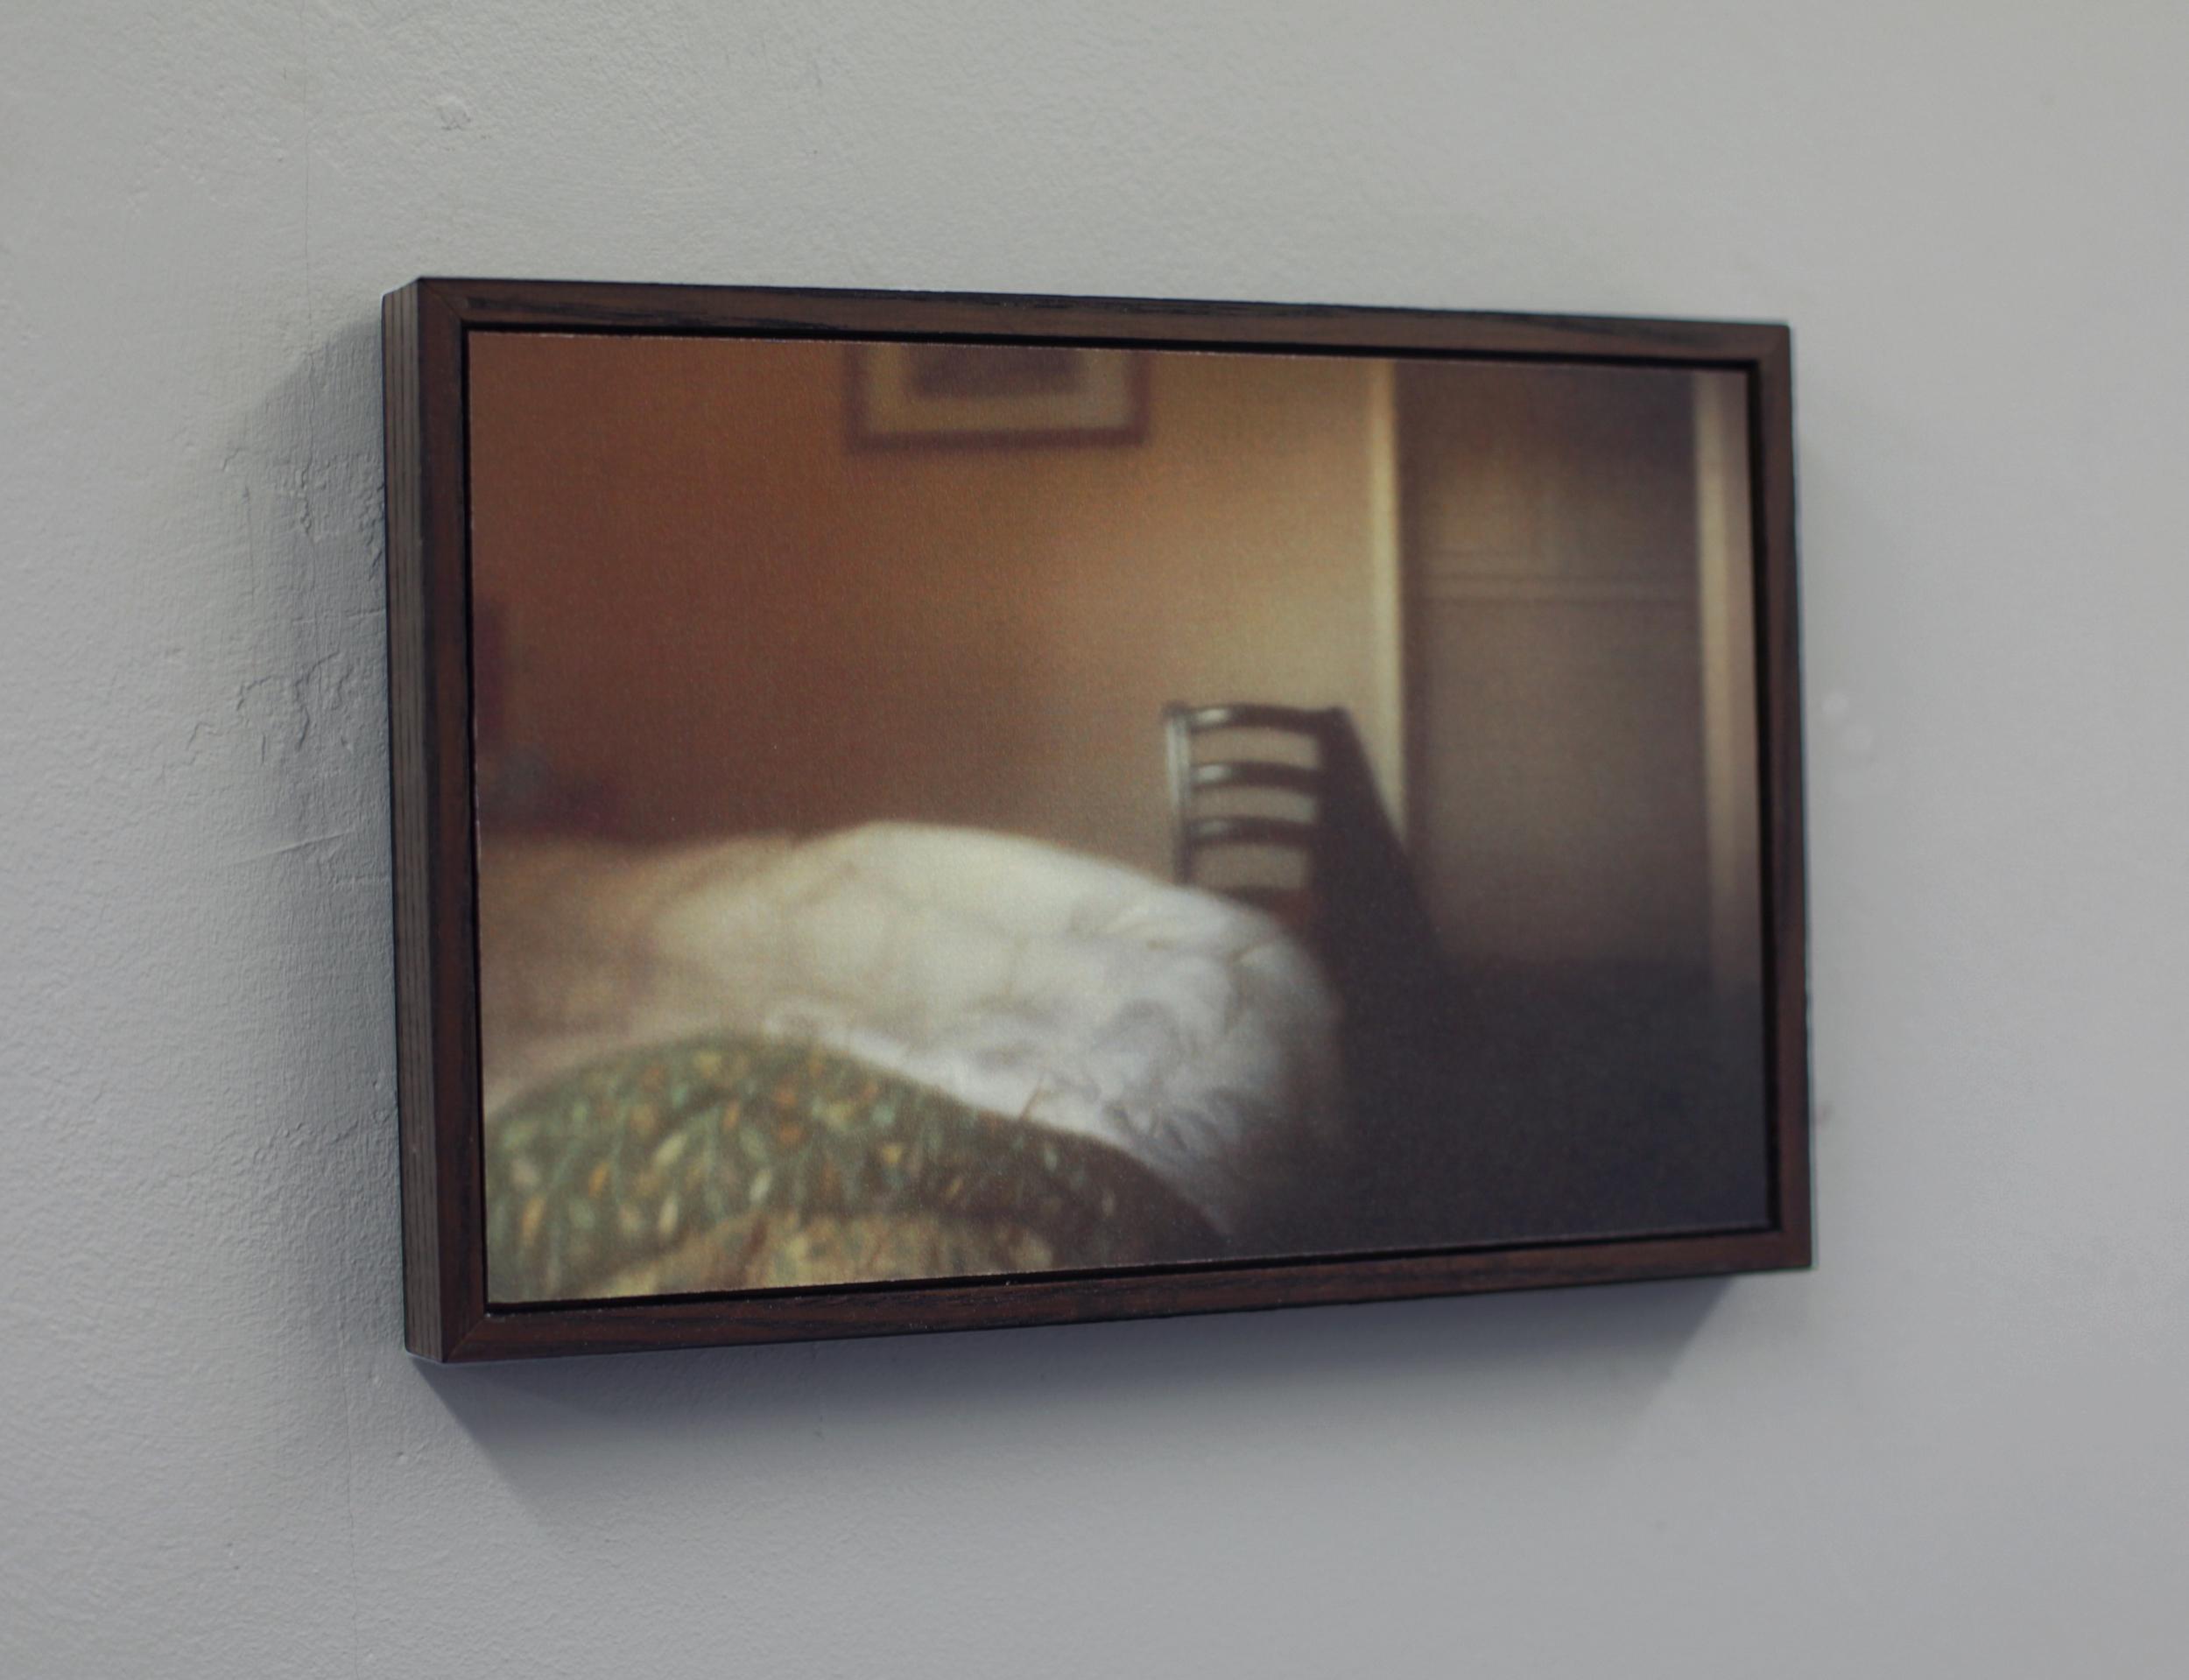 Installation shot: 'Lucca', 2011/15, Pinhole photograph, laser-print on 180gsm cartridge paper mounted on to aluminium, 12 x 18 cm